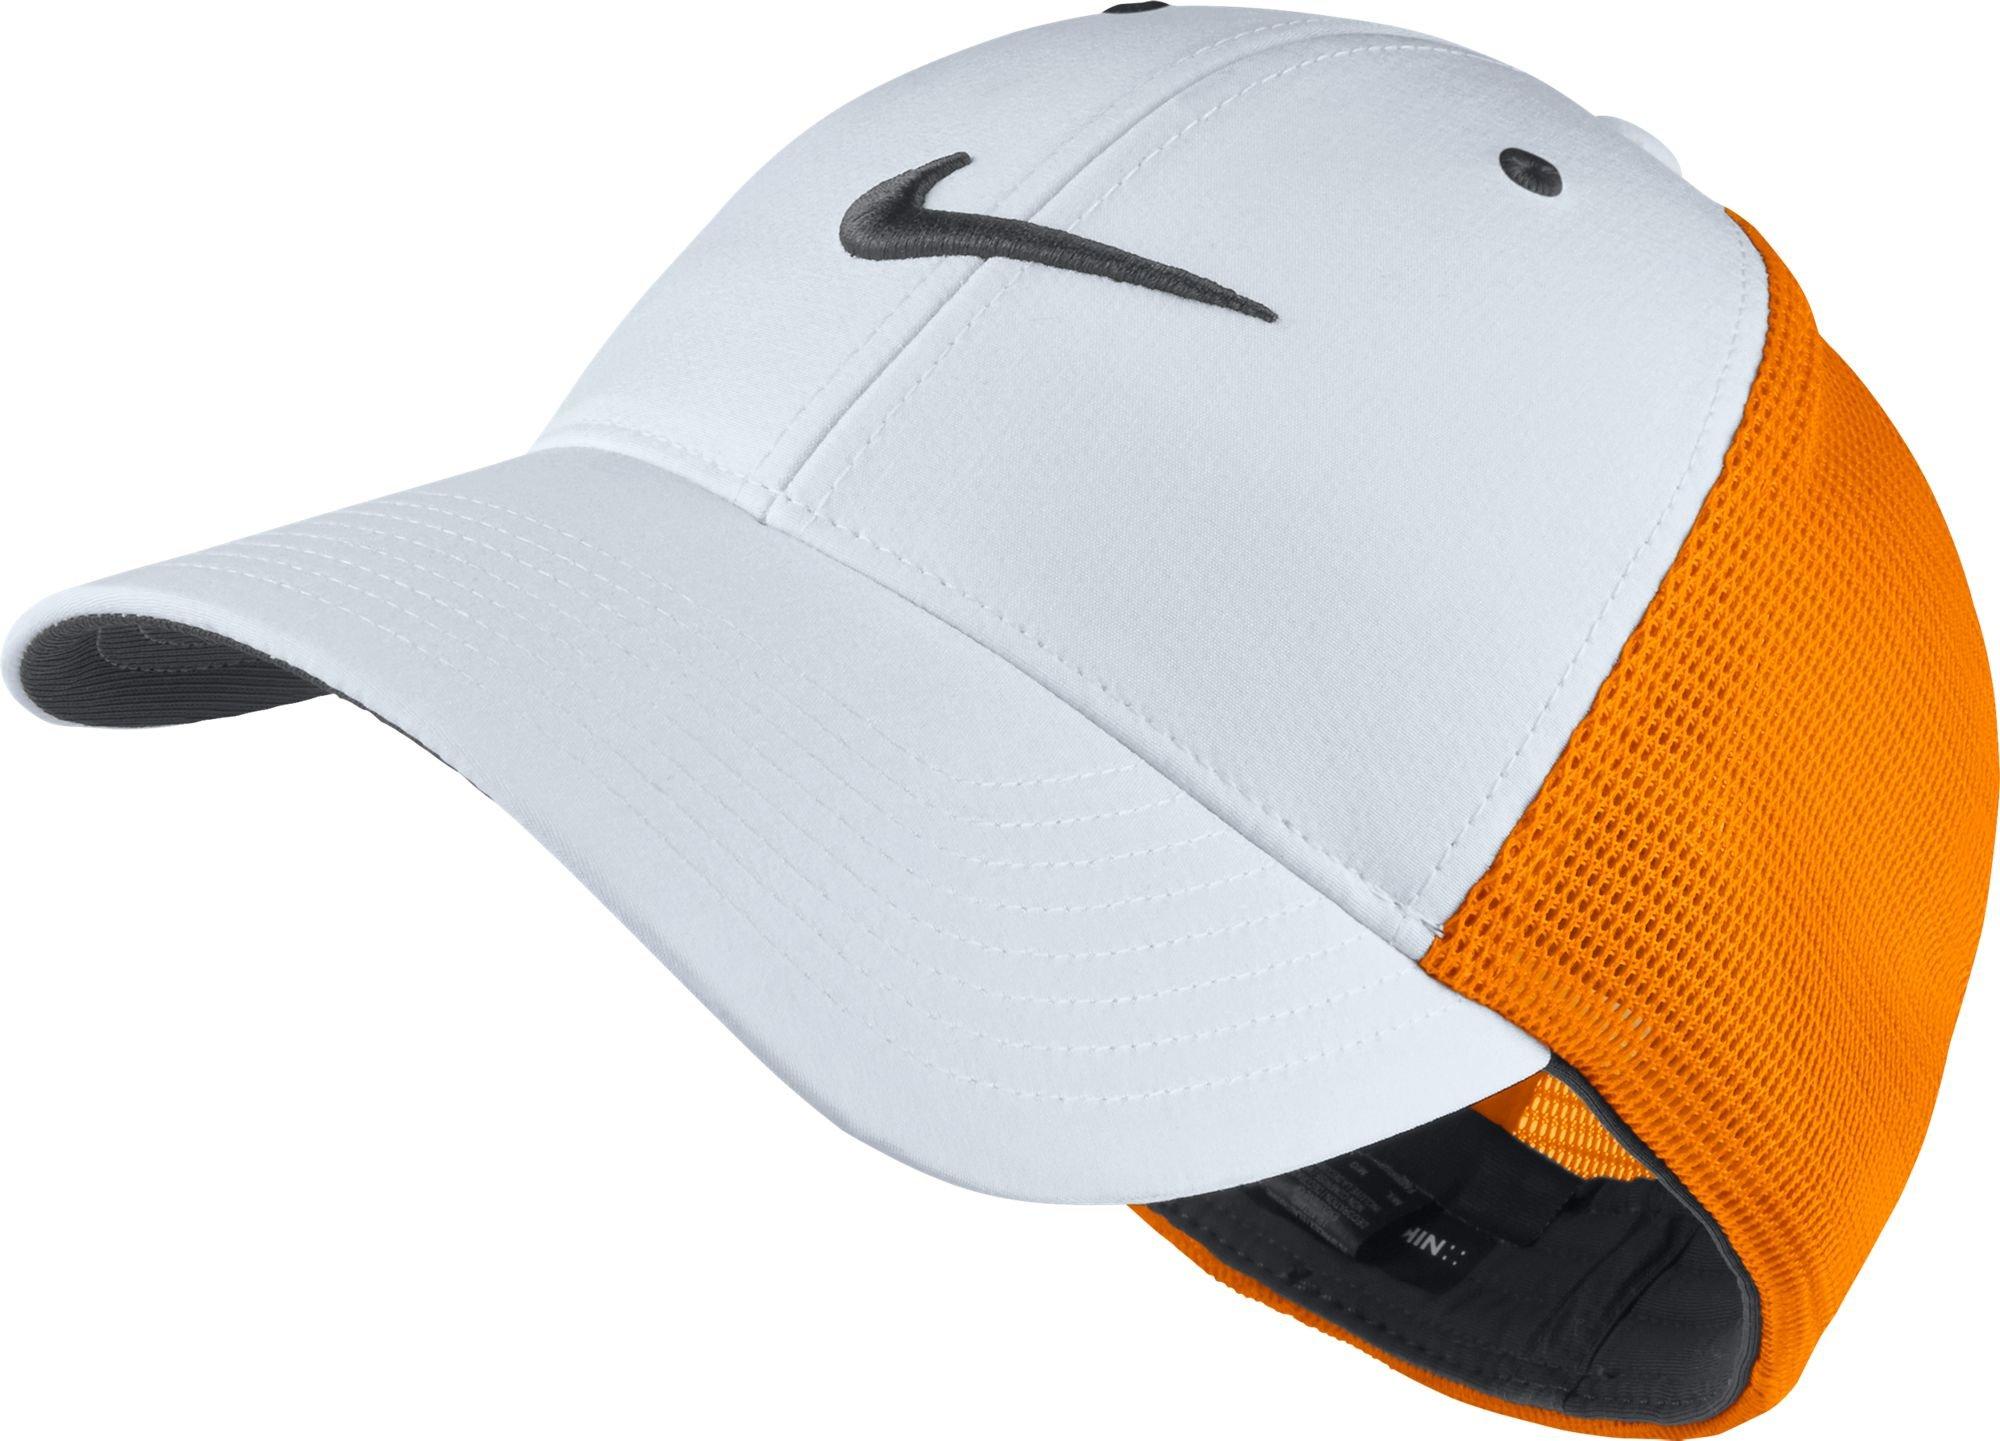 bbb2d7cc Galleon - Nike Men's Legacy 91 Tour Mesh Fitted Golf Hat (Vivid Orange/White/Grey),  Medium/Large